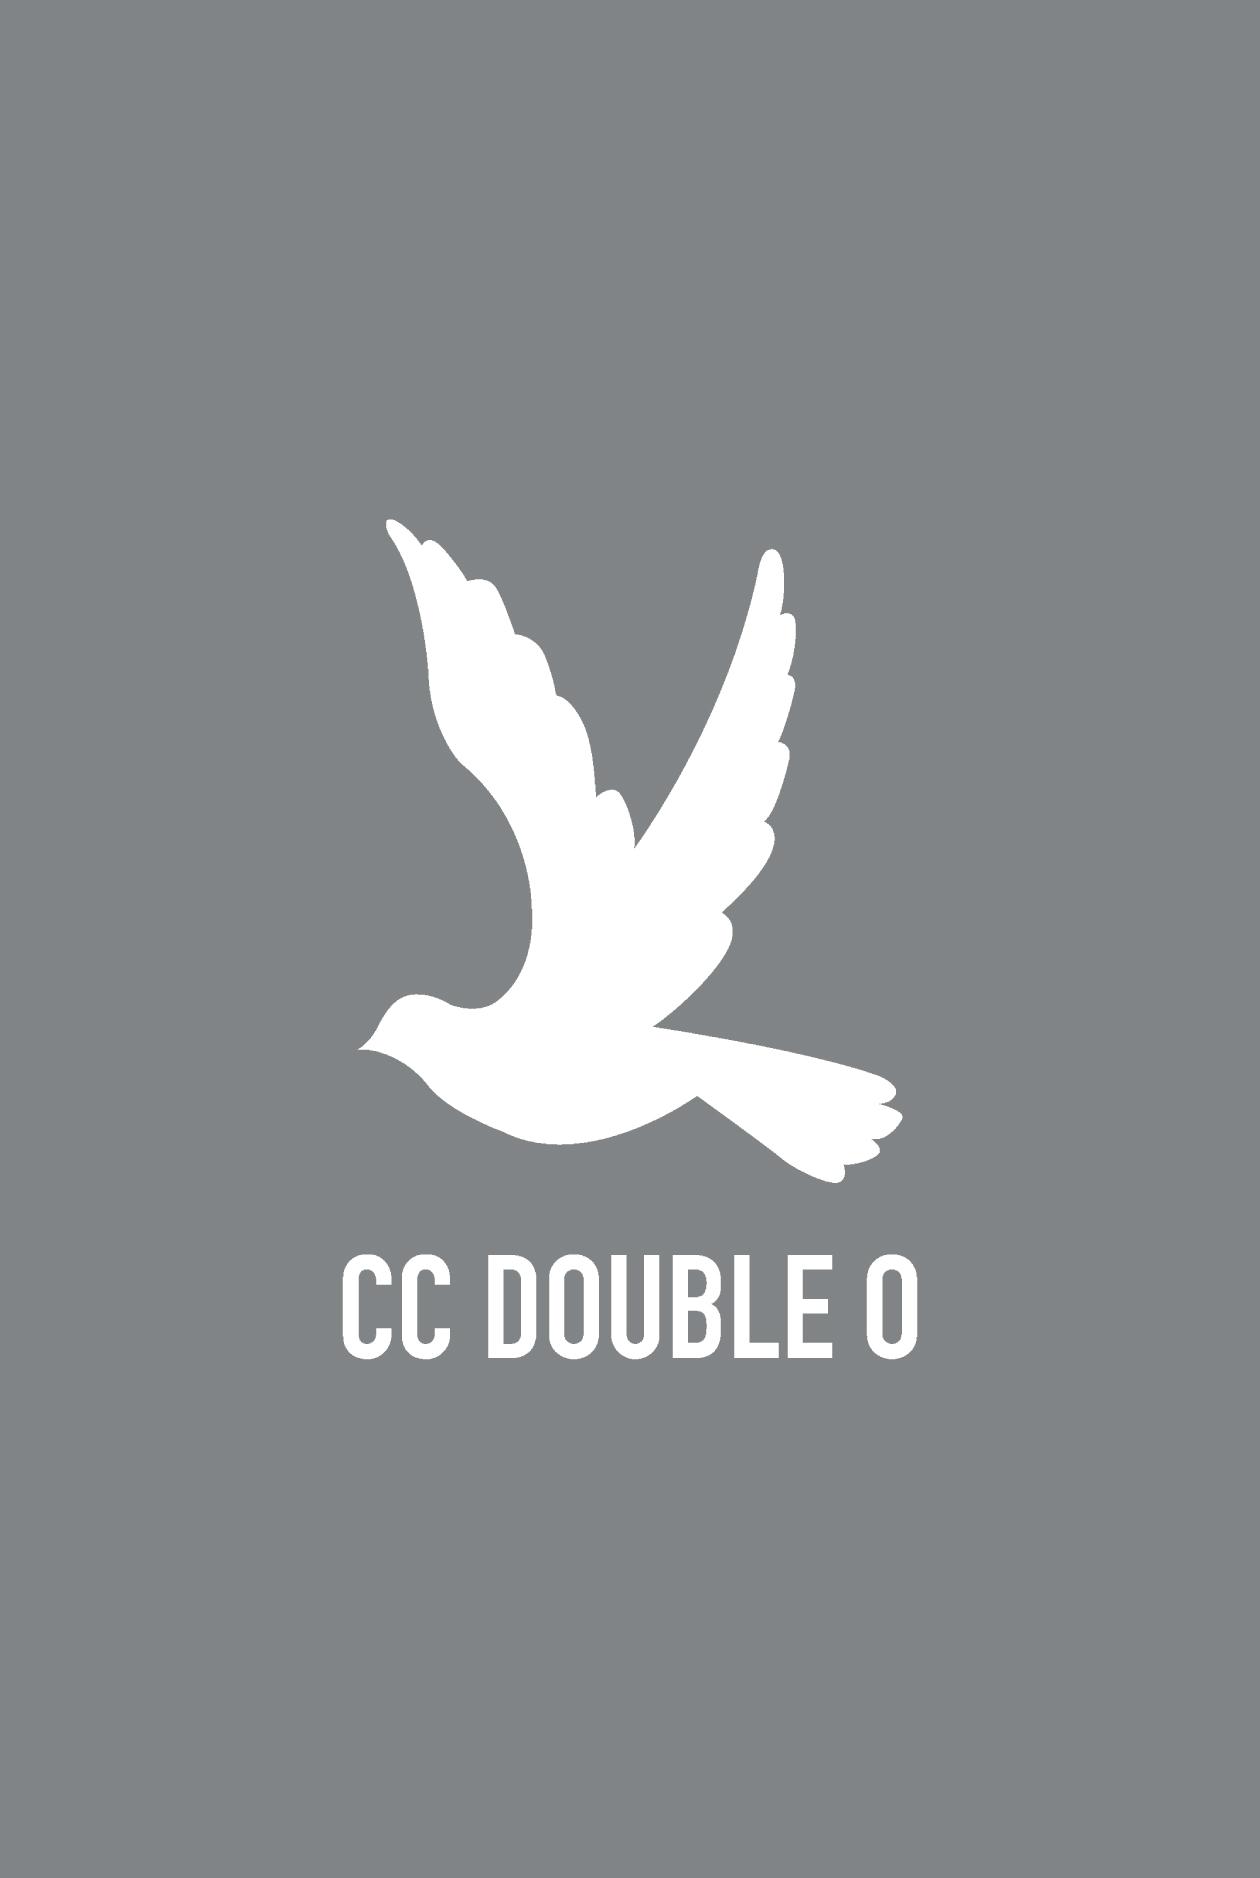 CC DOUBLE O Badge iPhone 7 & 8 Case